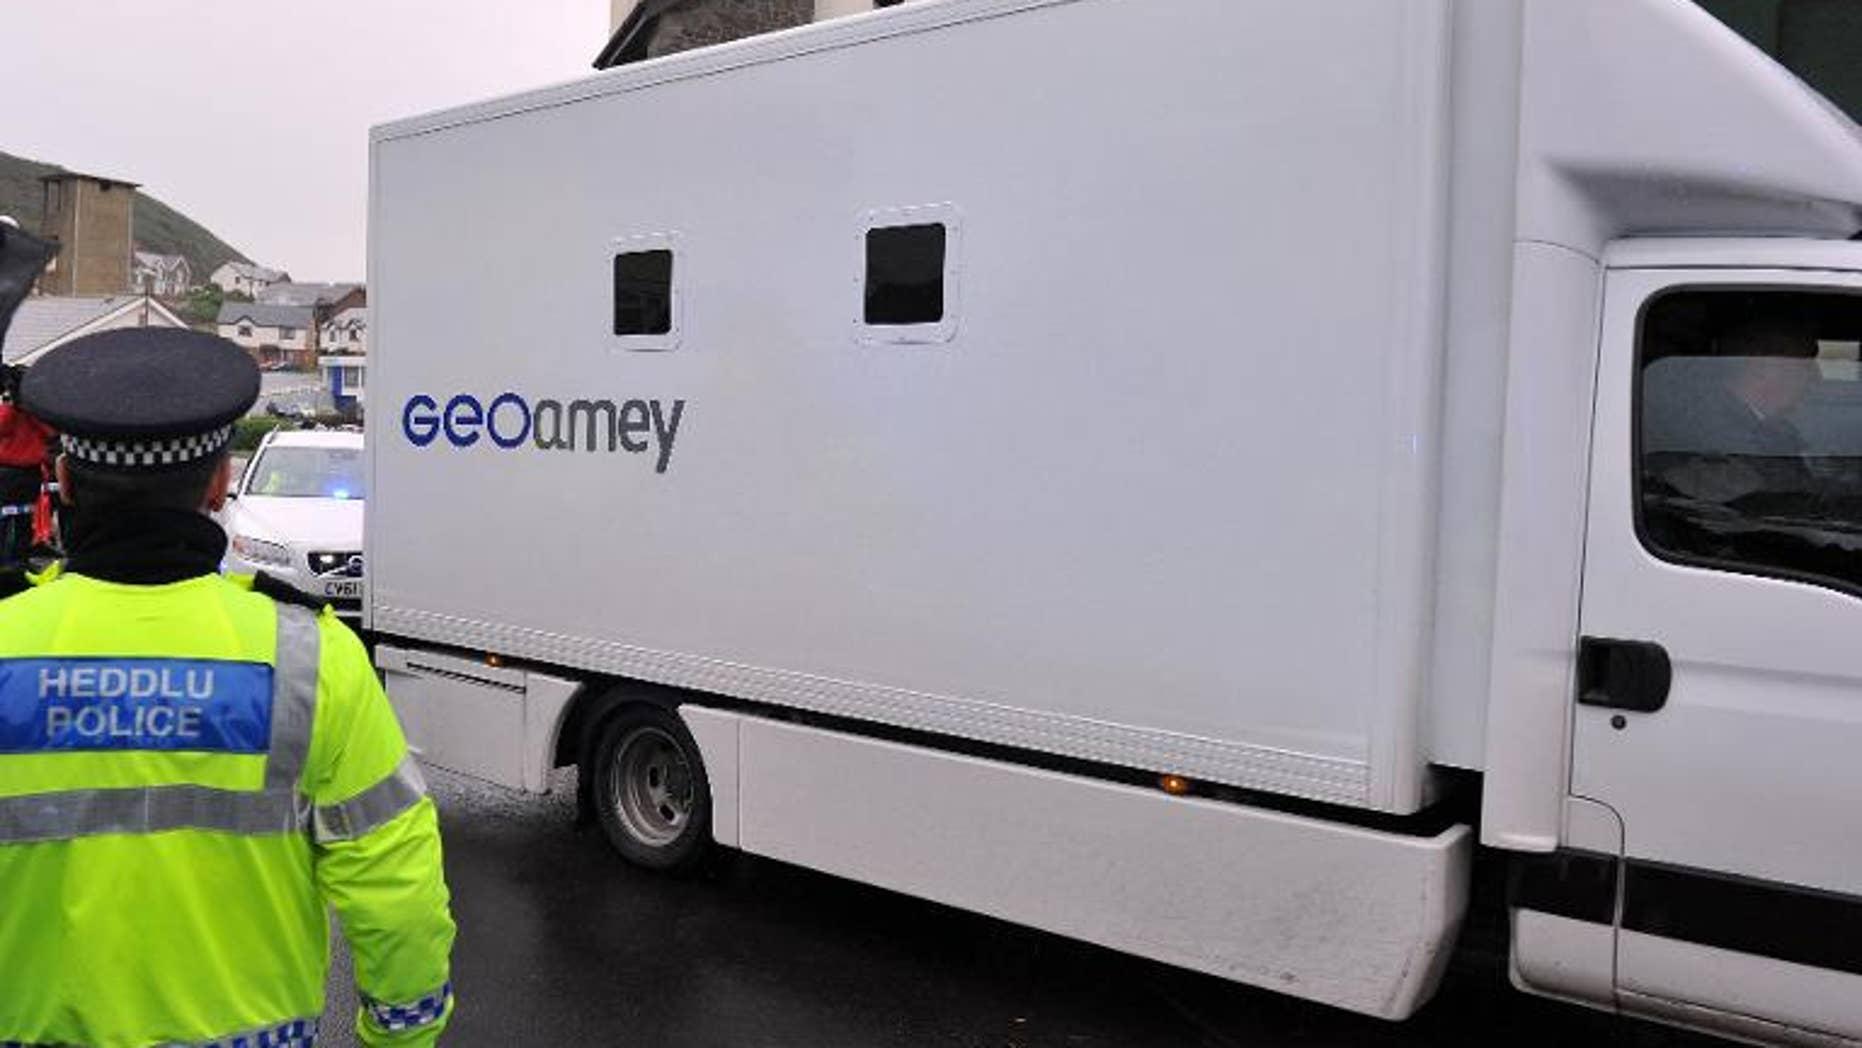 A prison van is seen in Wales on October 8, 2012.